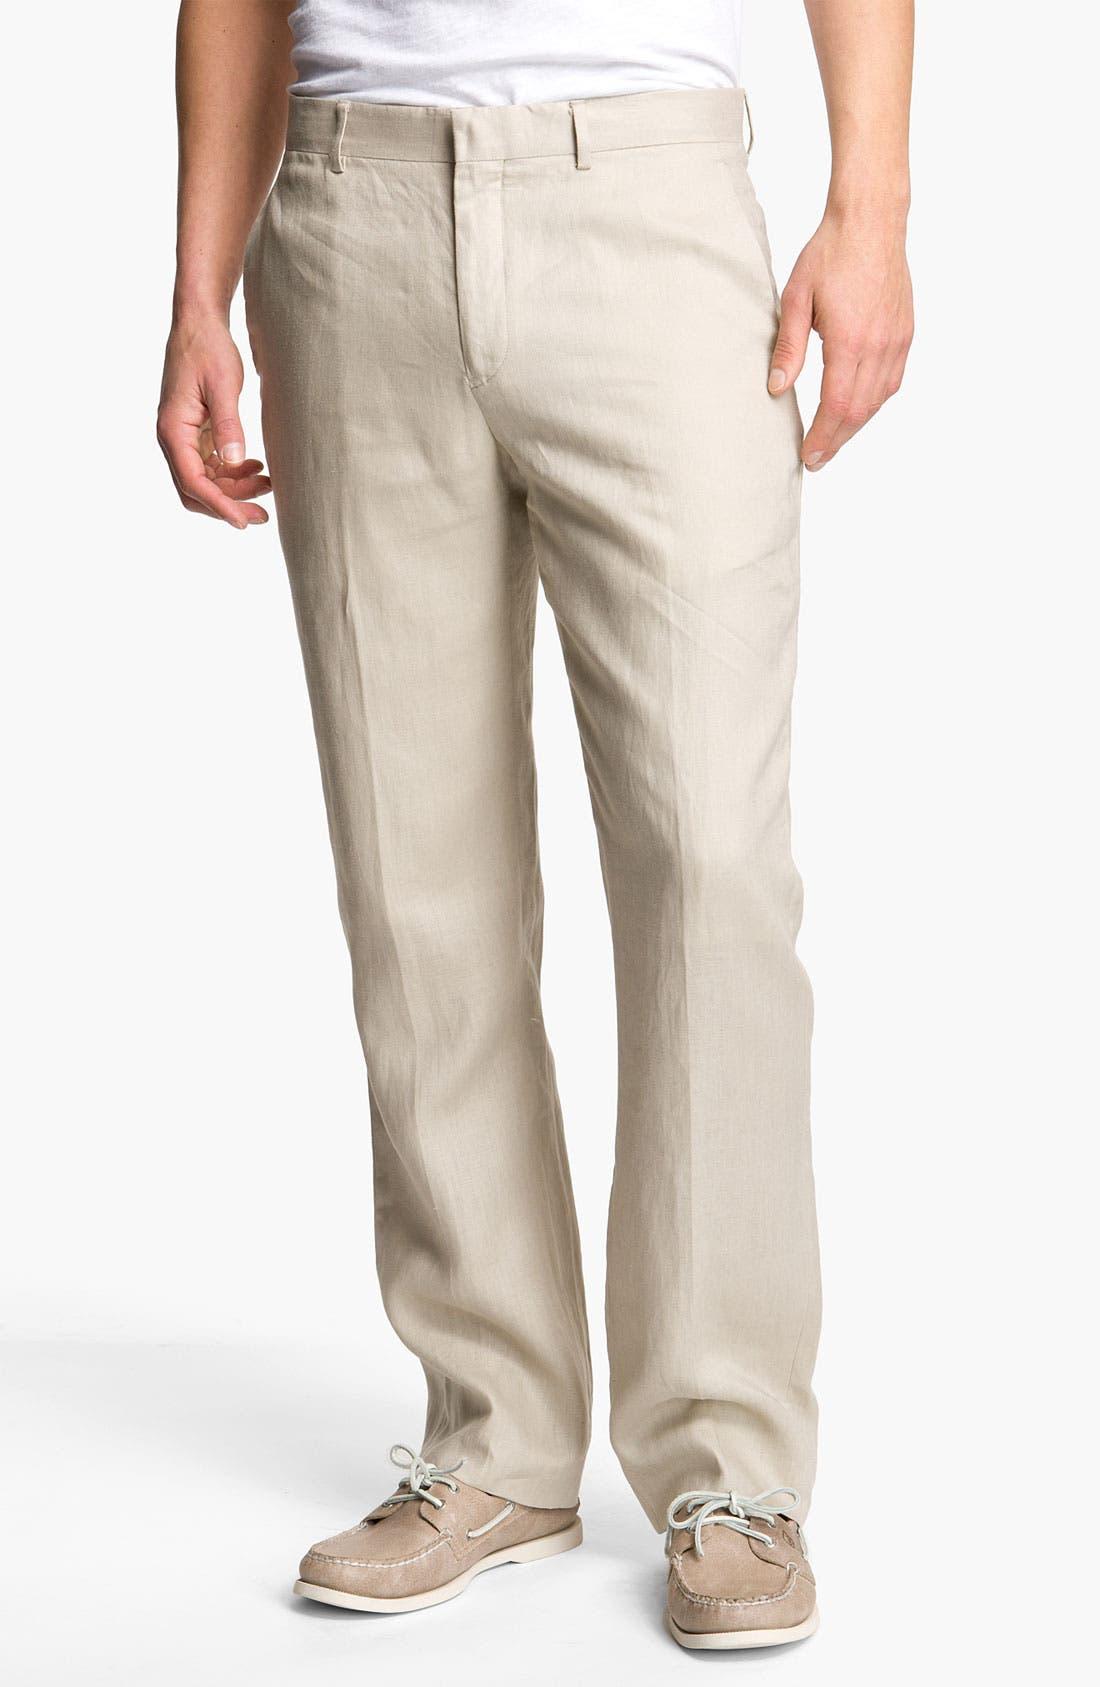 Alternate Image 1 Selected - Michael Kors 'Classic' Linen Pants